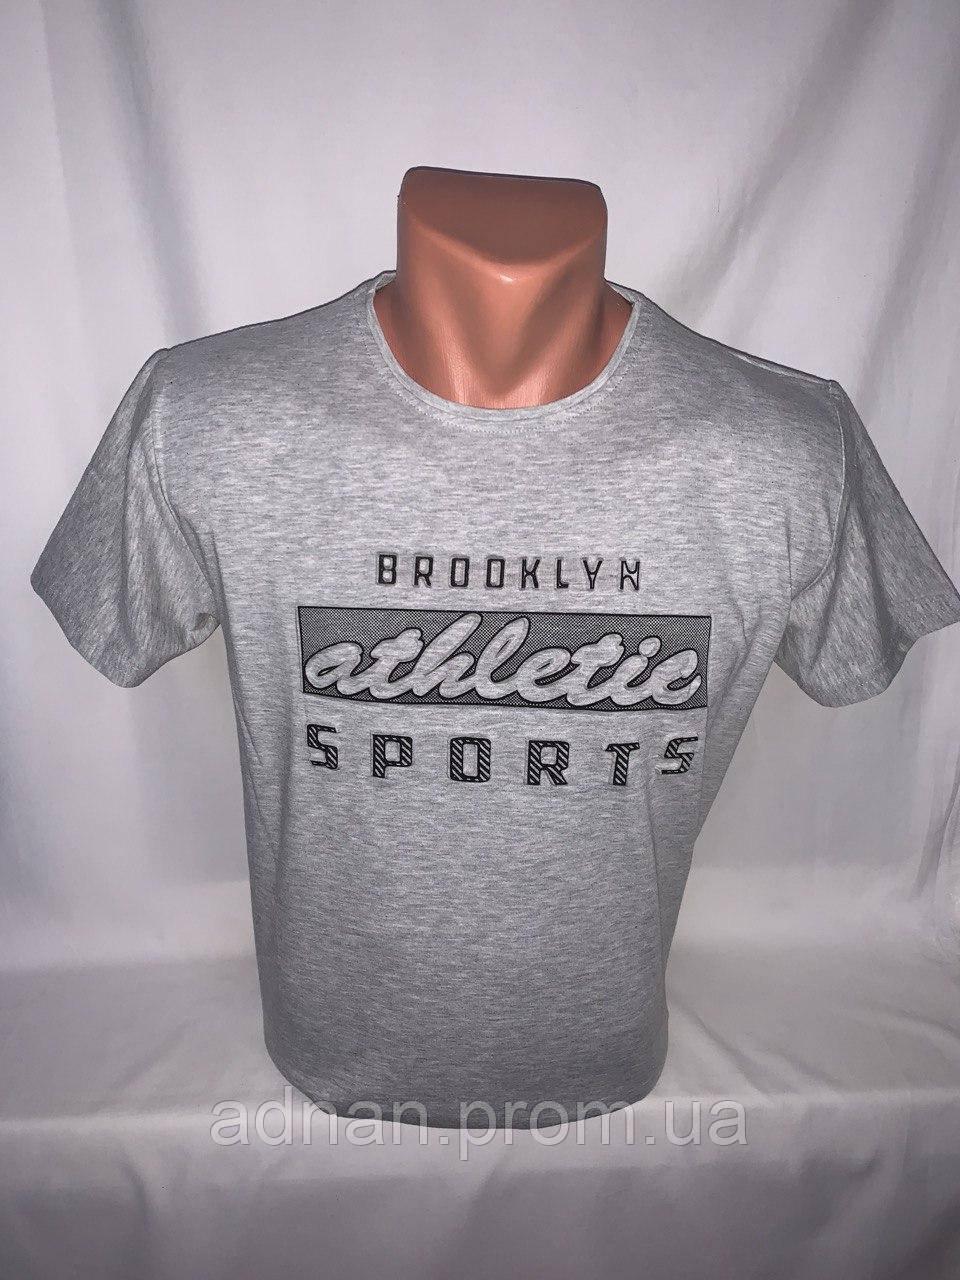 Футболка мужская RBS, накатка стрейч коттон ATHLETIC 008 \ купить футболку мужскую оптом